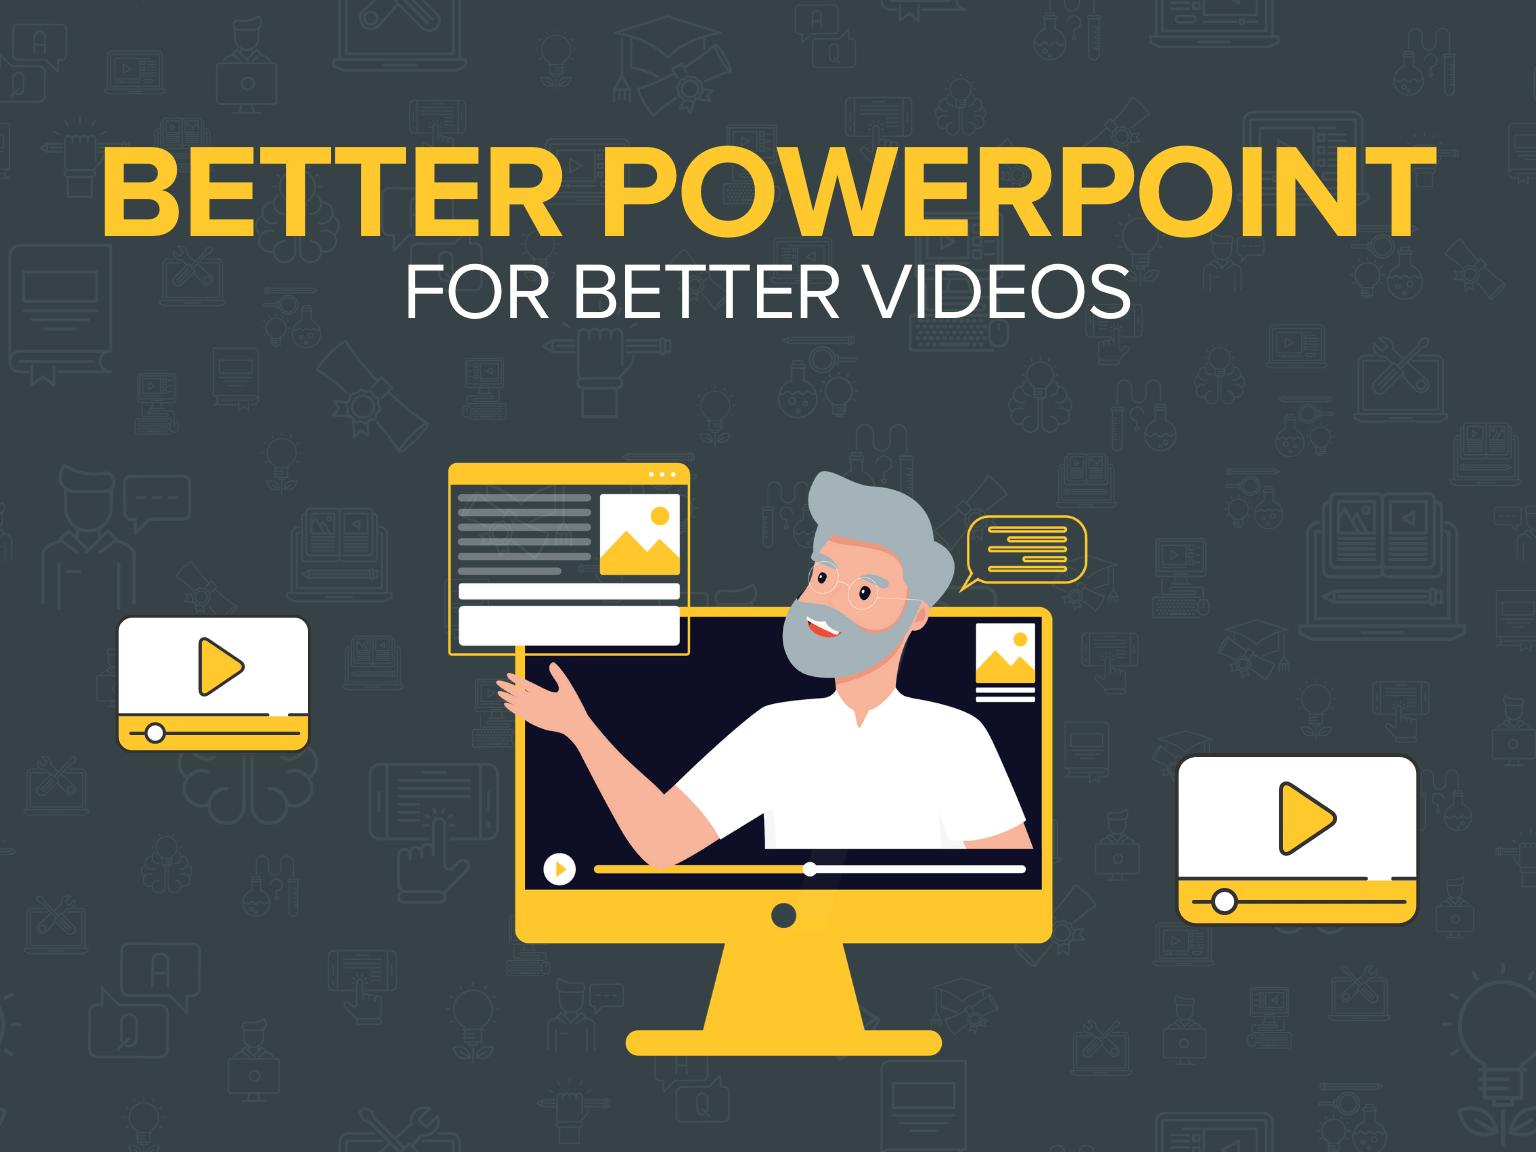 Better PowerPoint for Better Videos